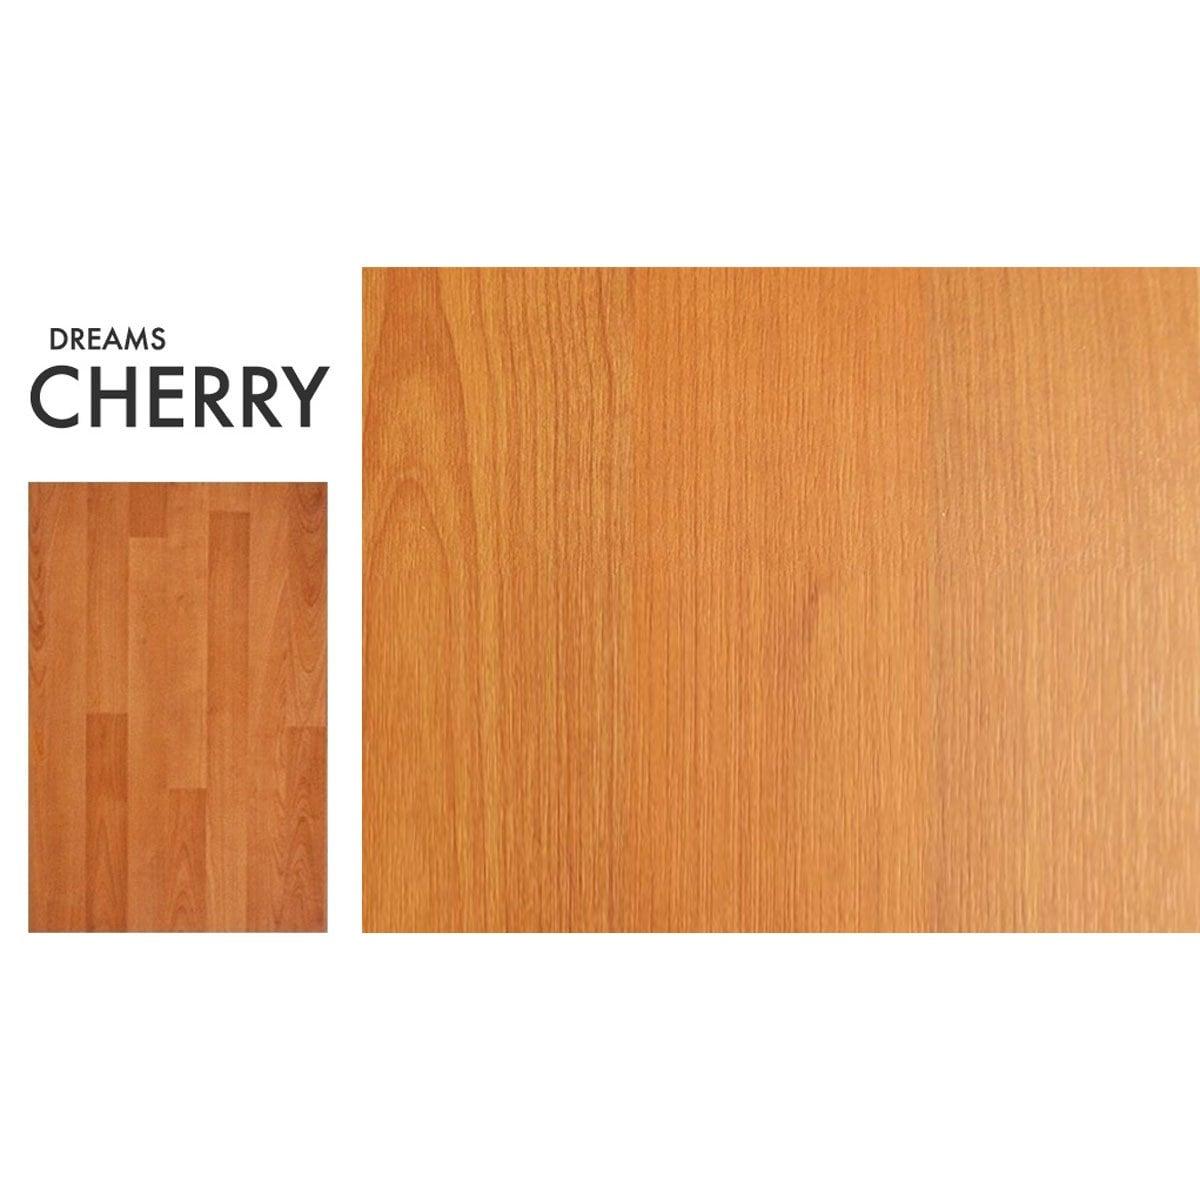 Piso Laminado Dreams Cherry 7Mm X Caja Int 4 Ent I. Modelo: Pl4Dreamsei